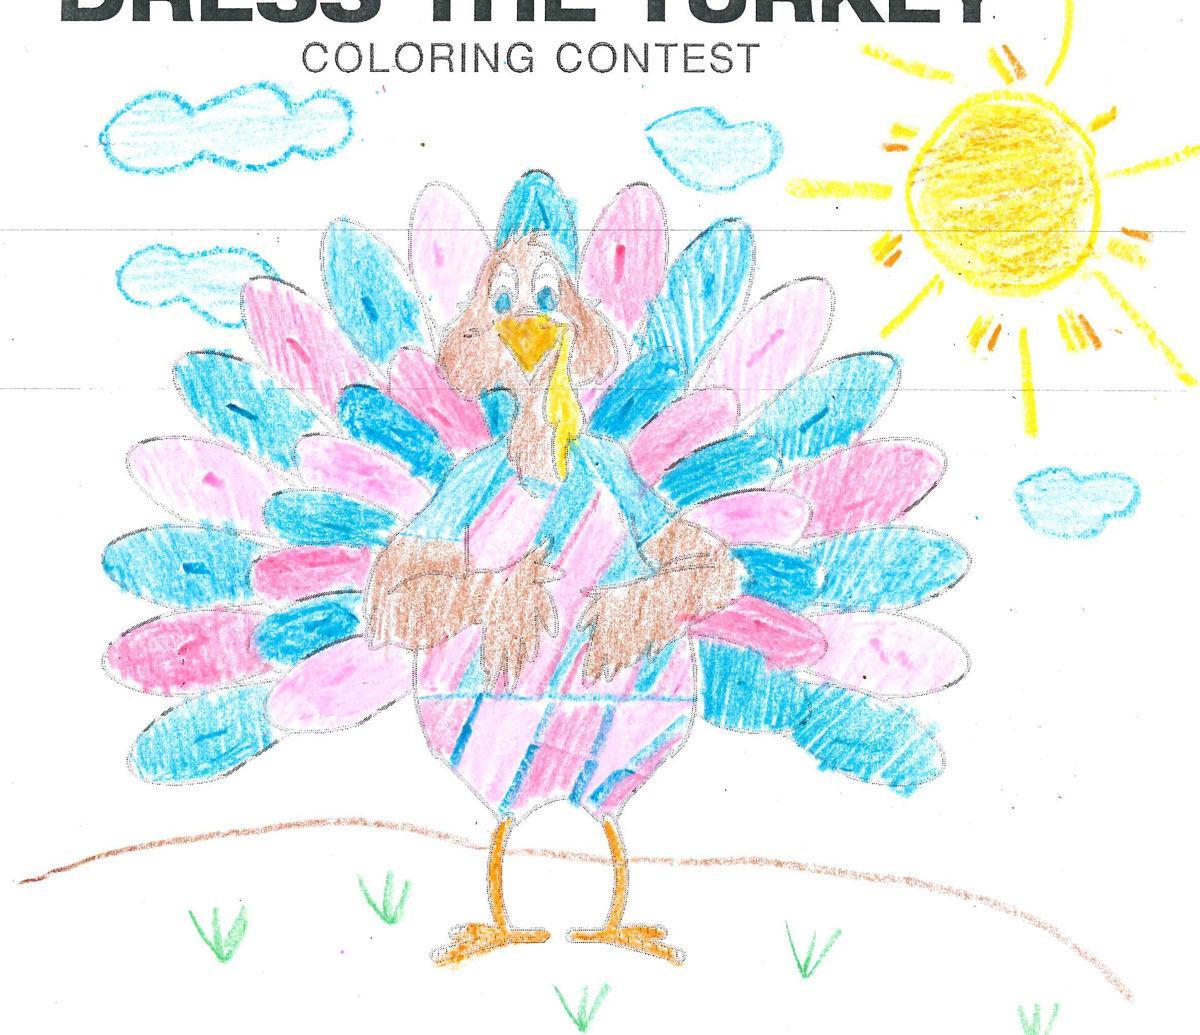 2015 Prize Turkeys Gallery 2 | News | kokomotribune.com